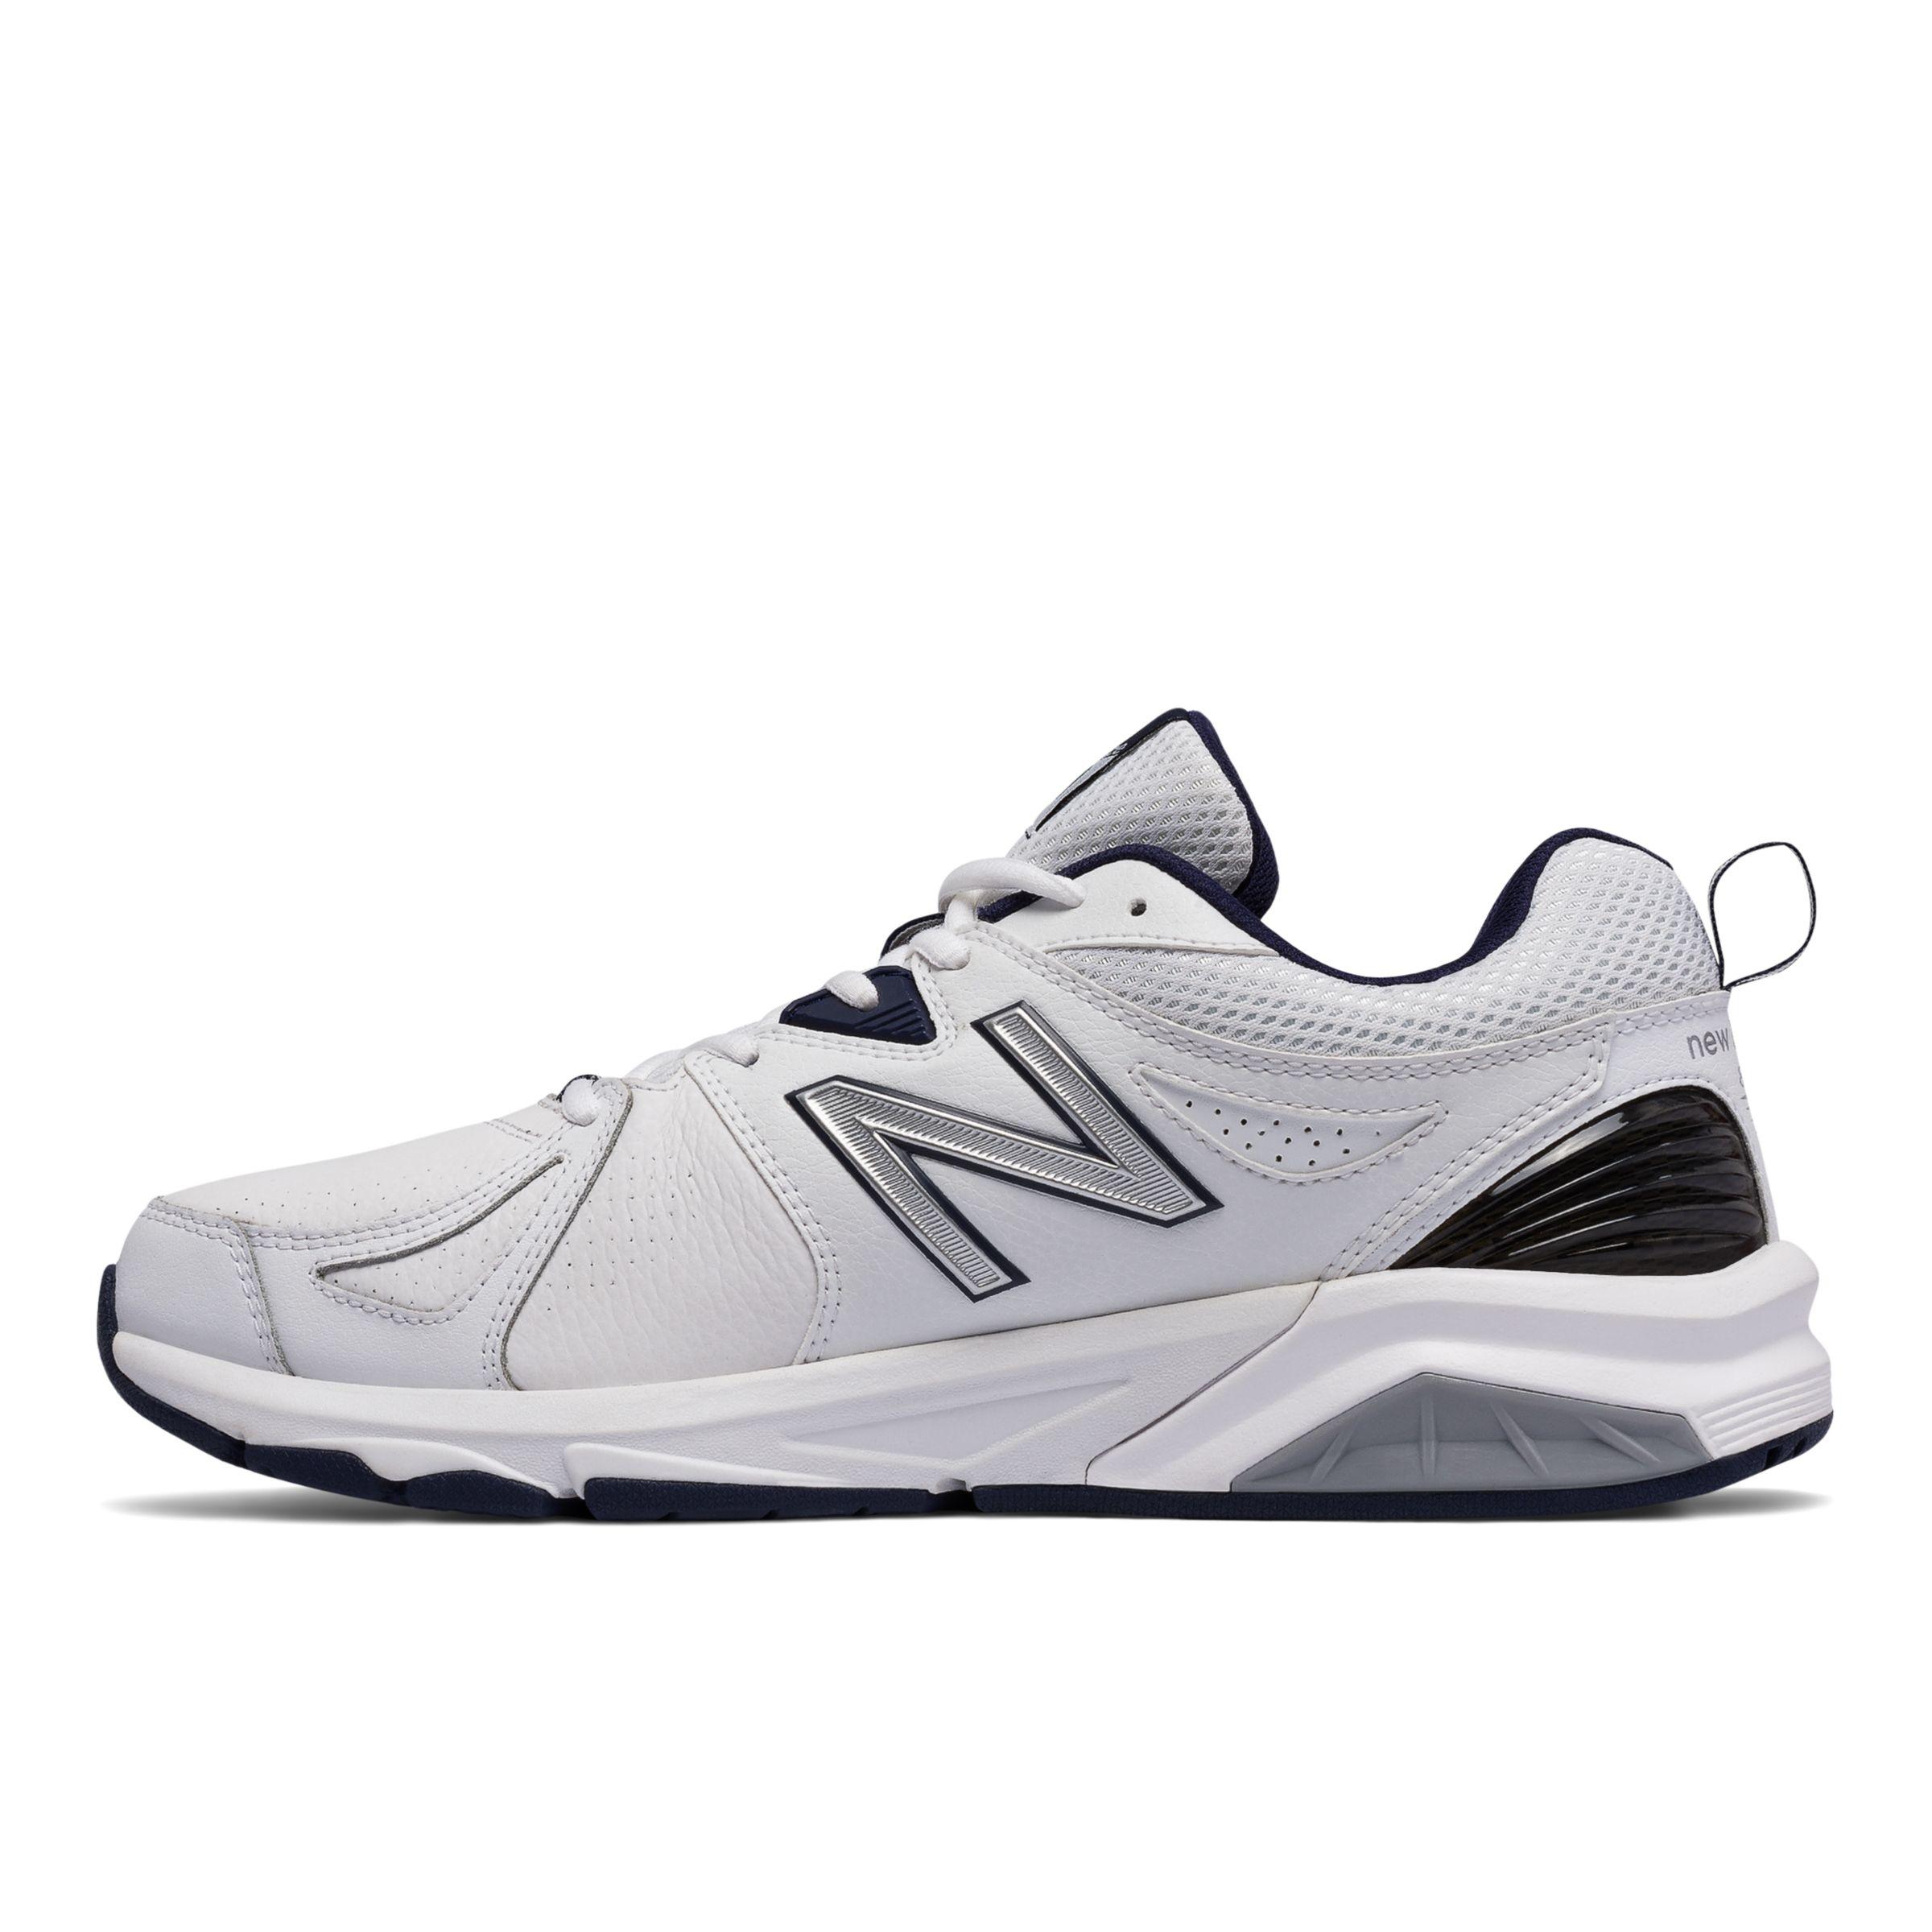 thumbnail 10 - New-Balance-857v2-Men-039-s-Running-Training-Shoes